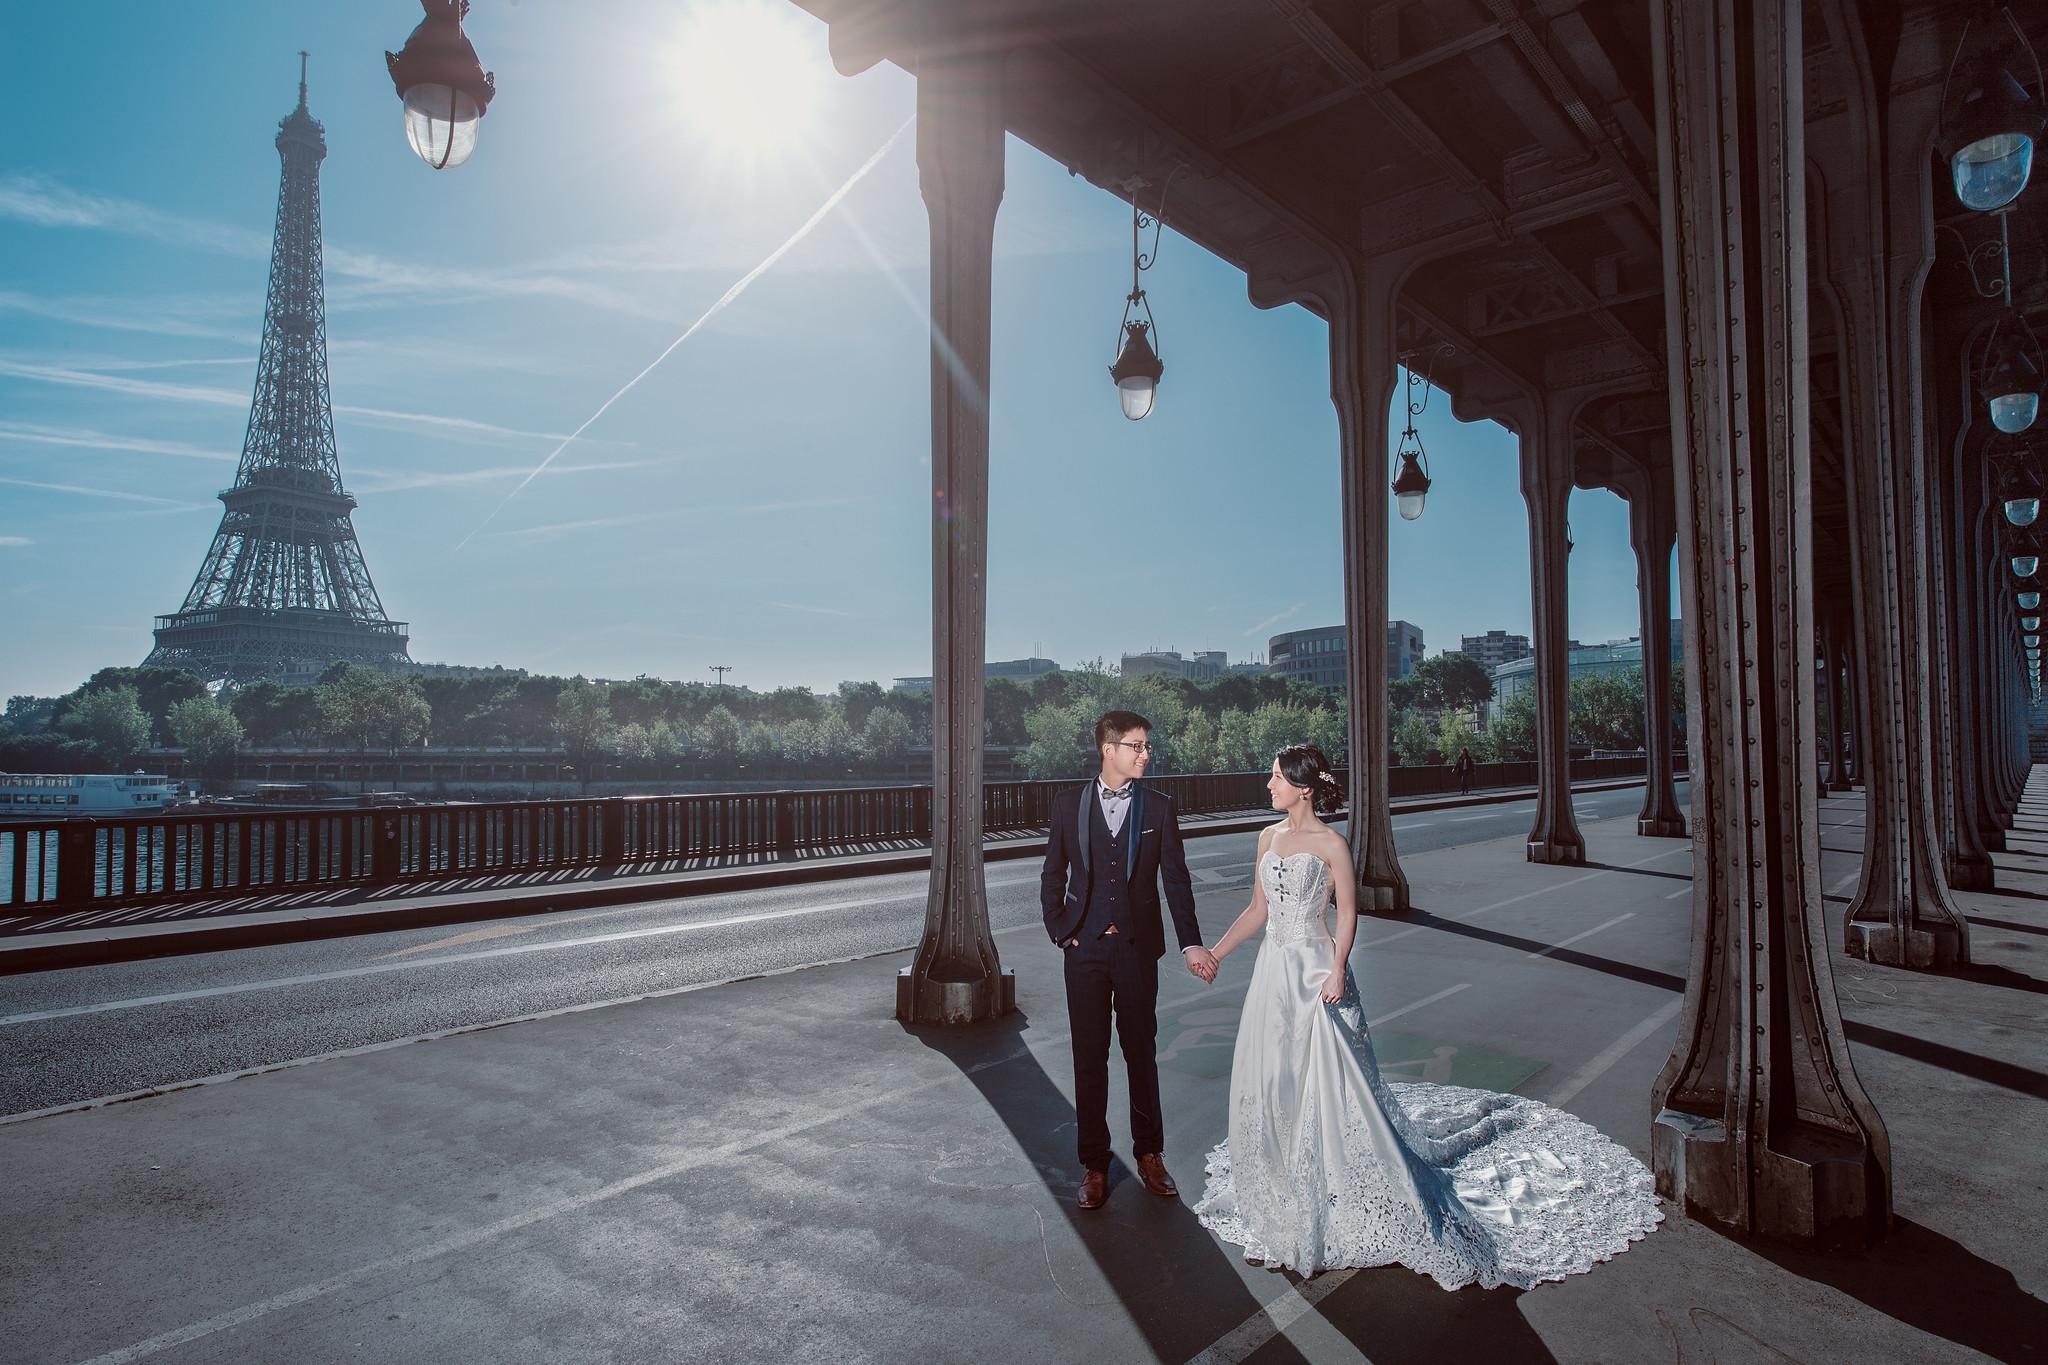 Donfer Photography, EASTERN WEDDING, 東法, 巴黎婚紗, Paris, 全面啟動, 海外婚紗, 藝術婚紗